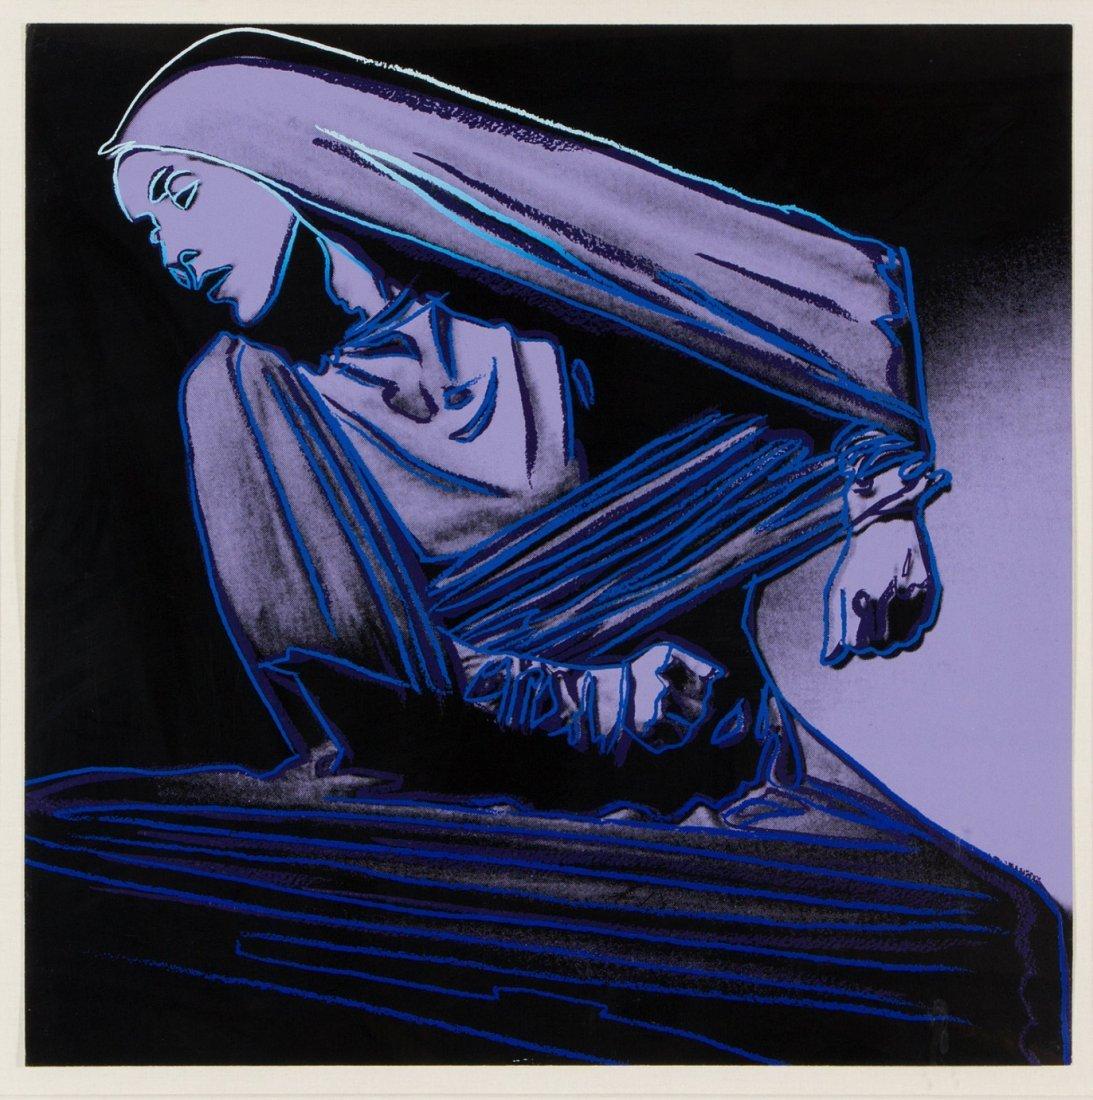 Lamentation by Andy Warhol: printed 1986